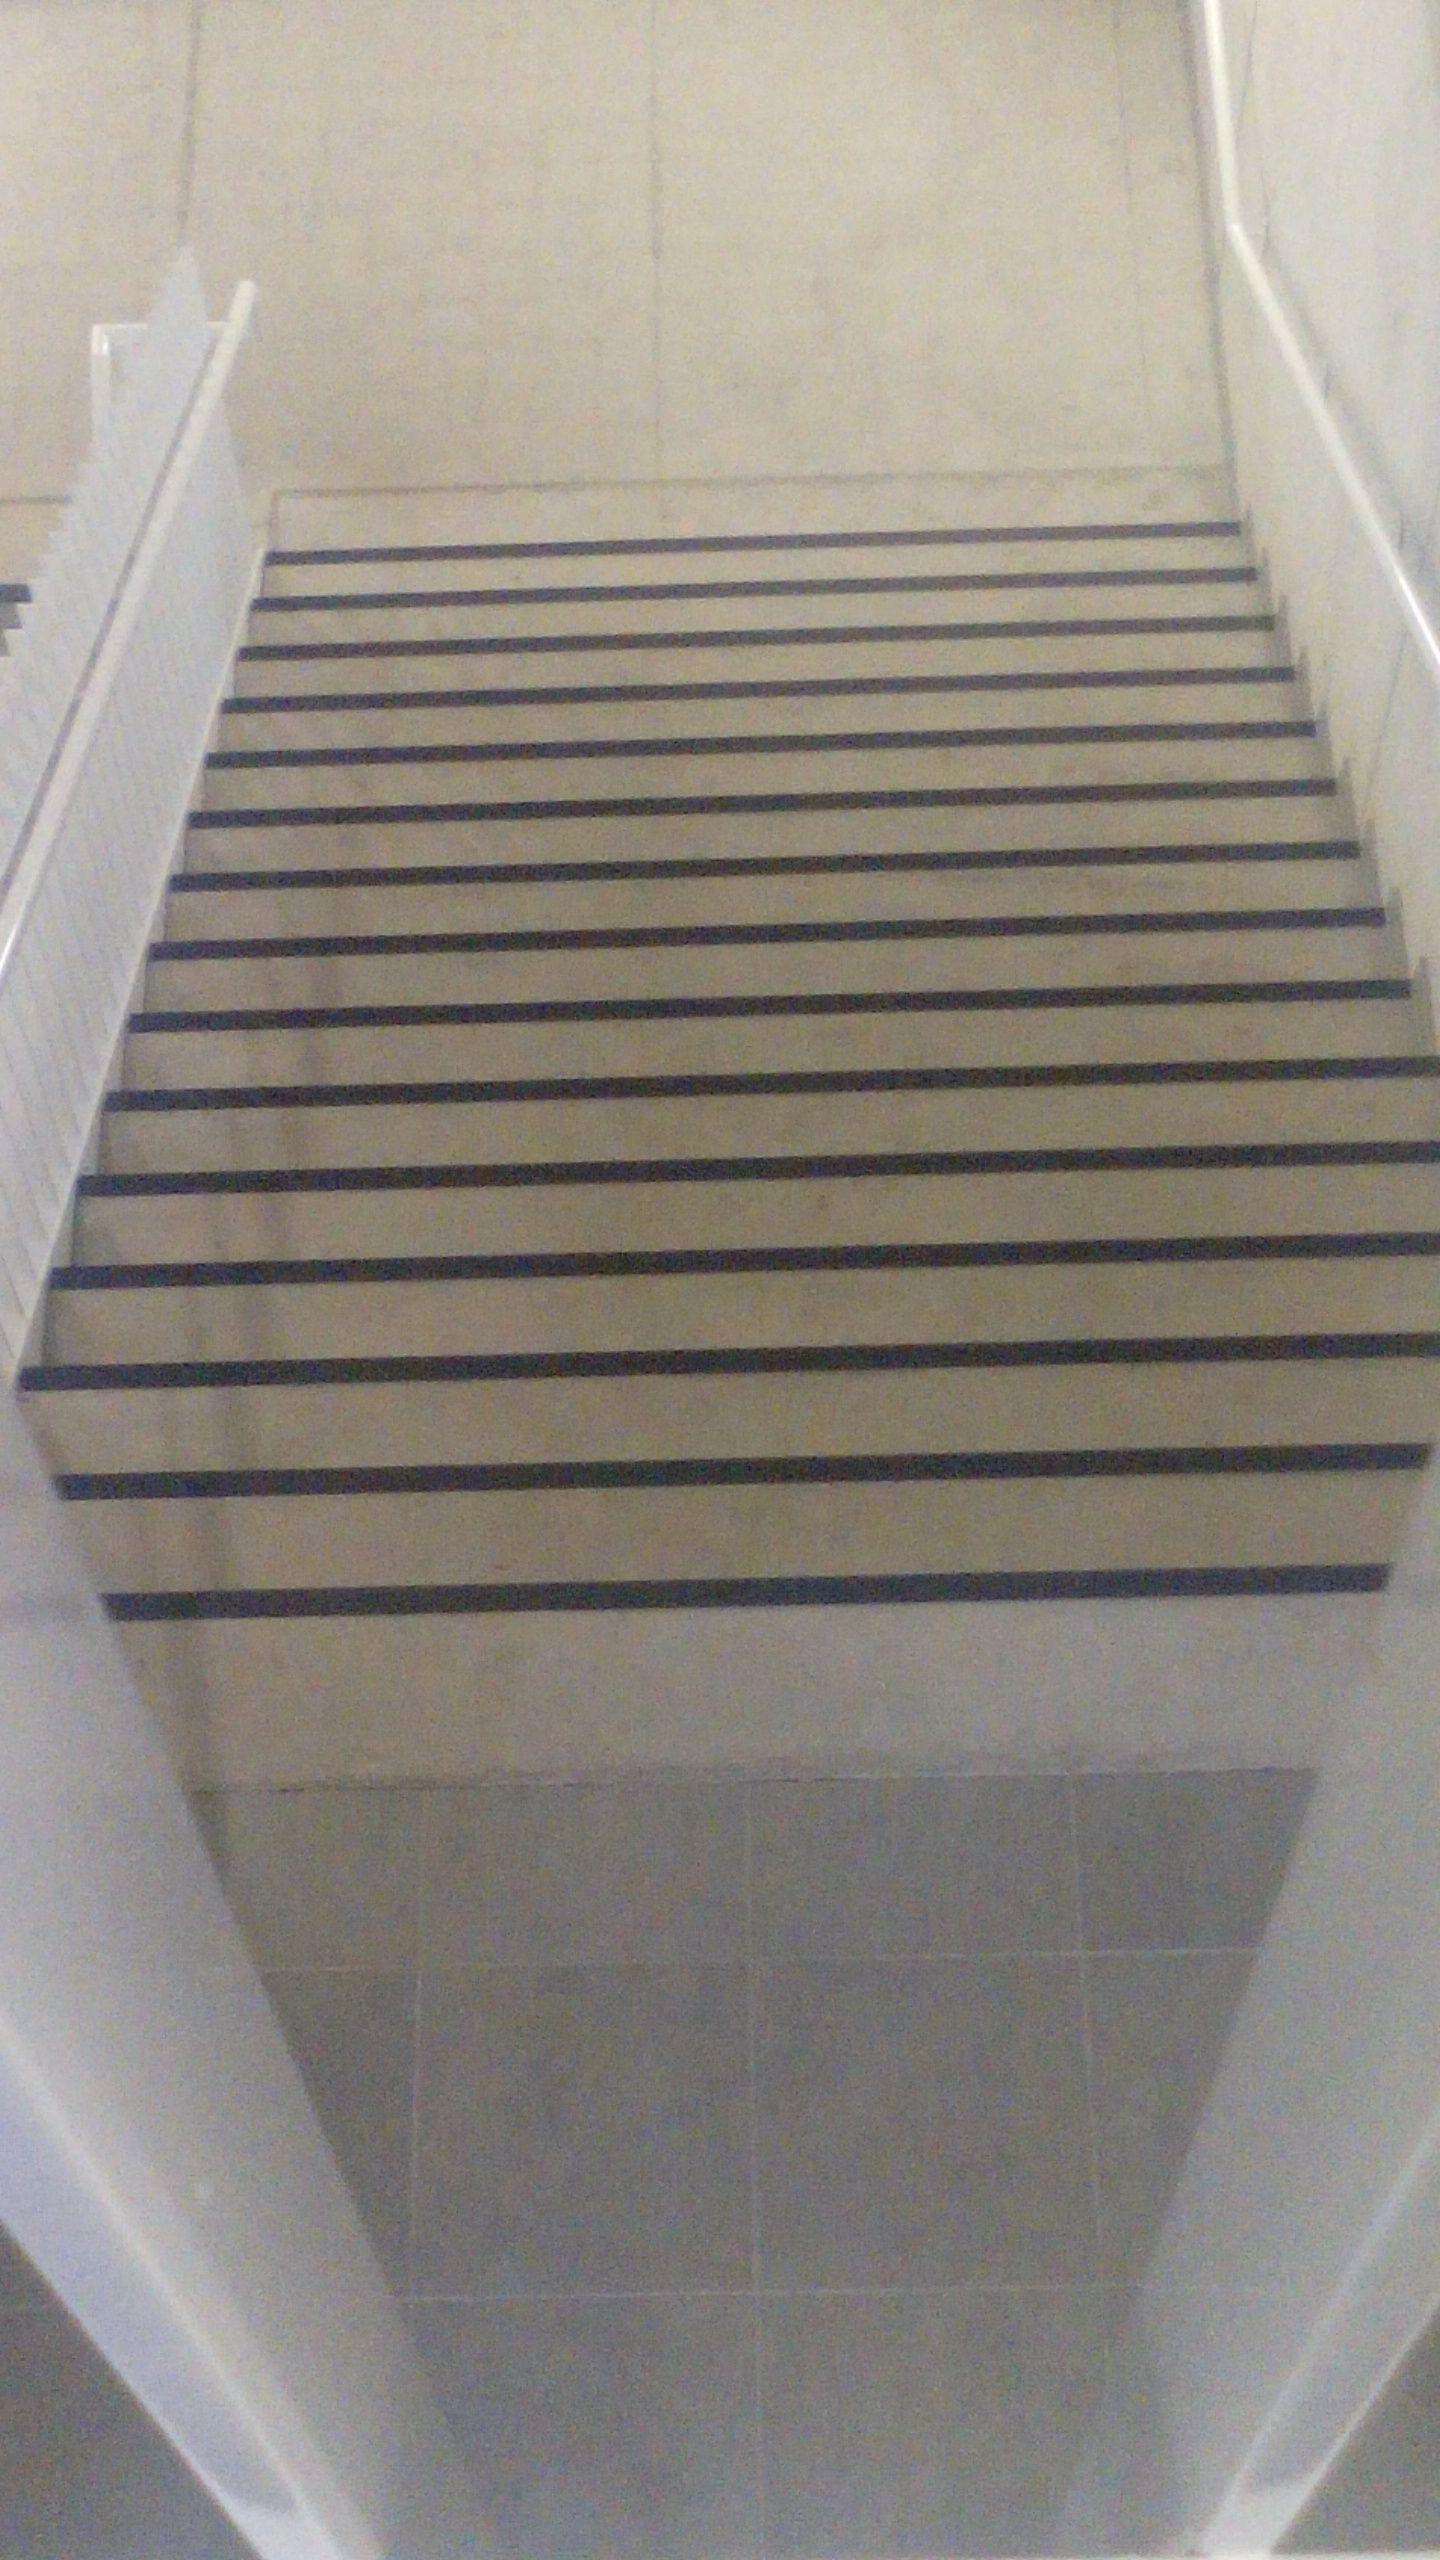 zwarte, dikke lijnen op de trap.